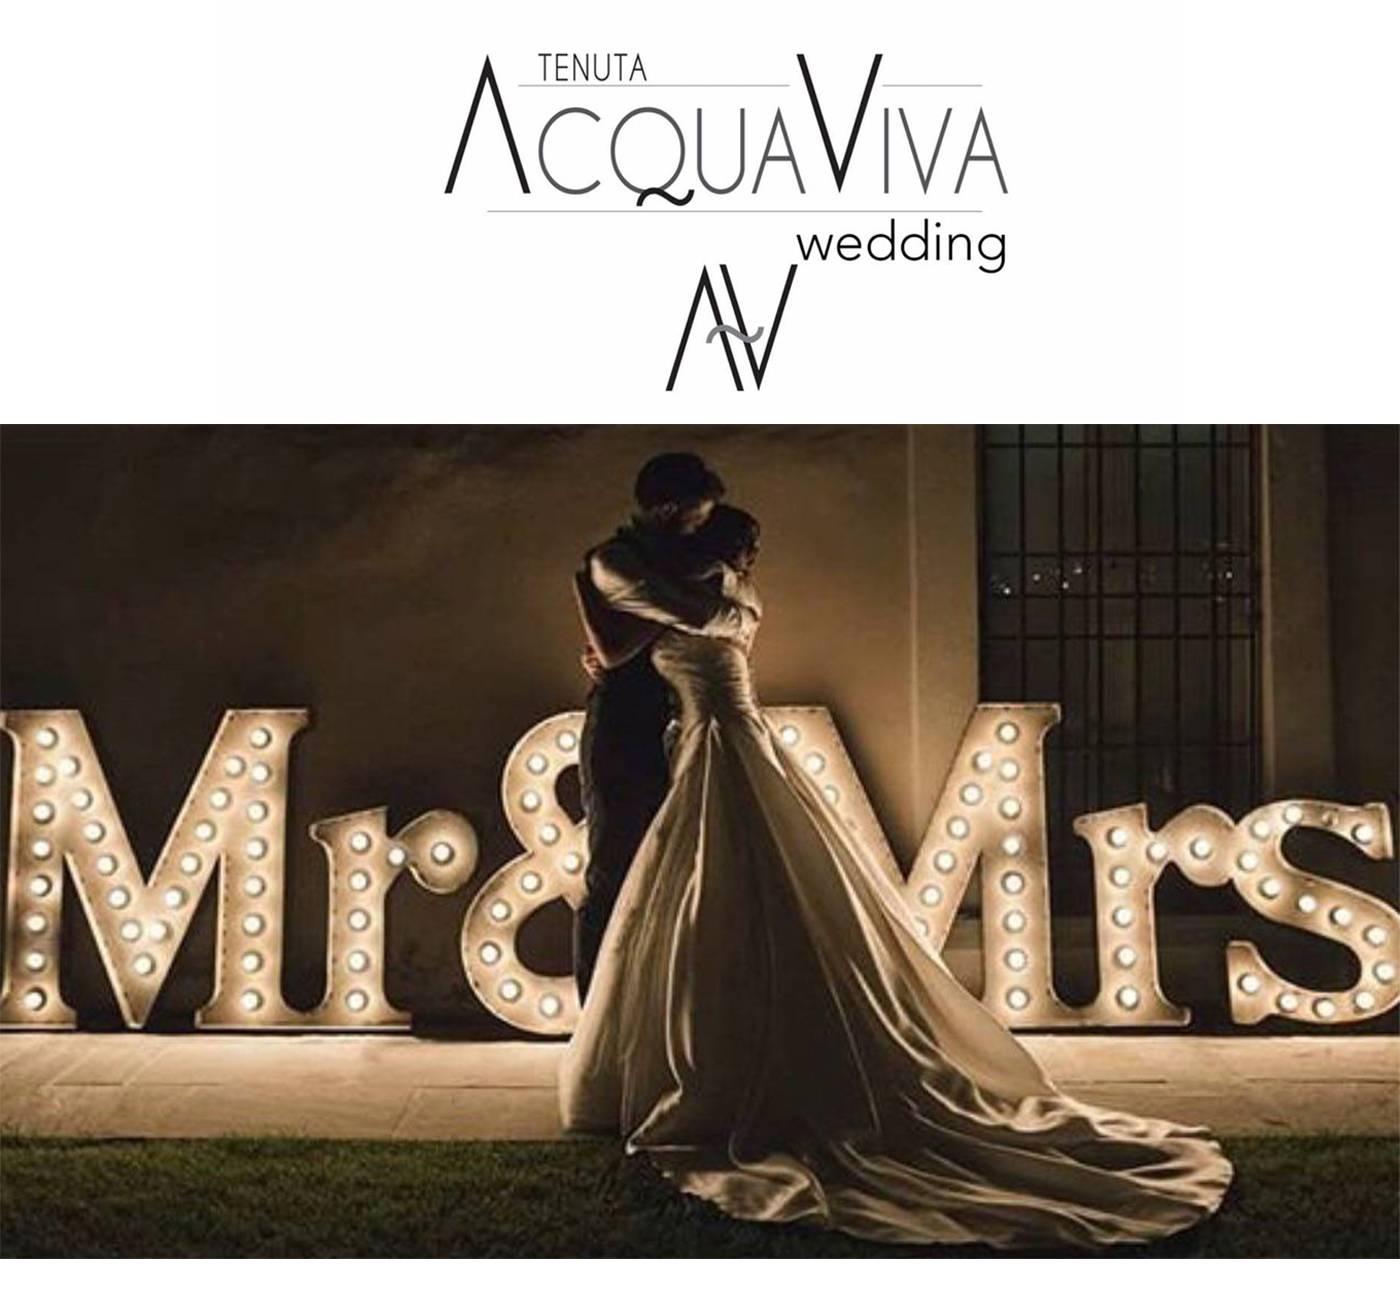 Tenuta Acquaviva Wedding